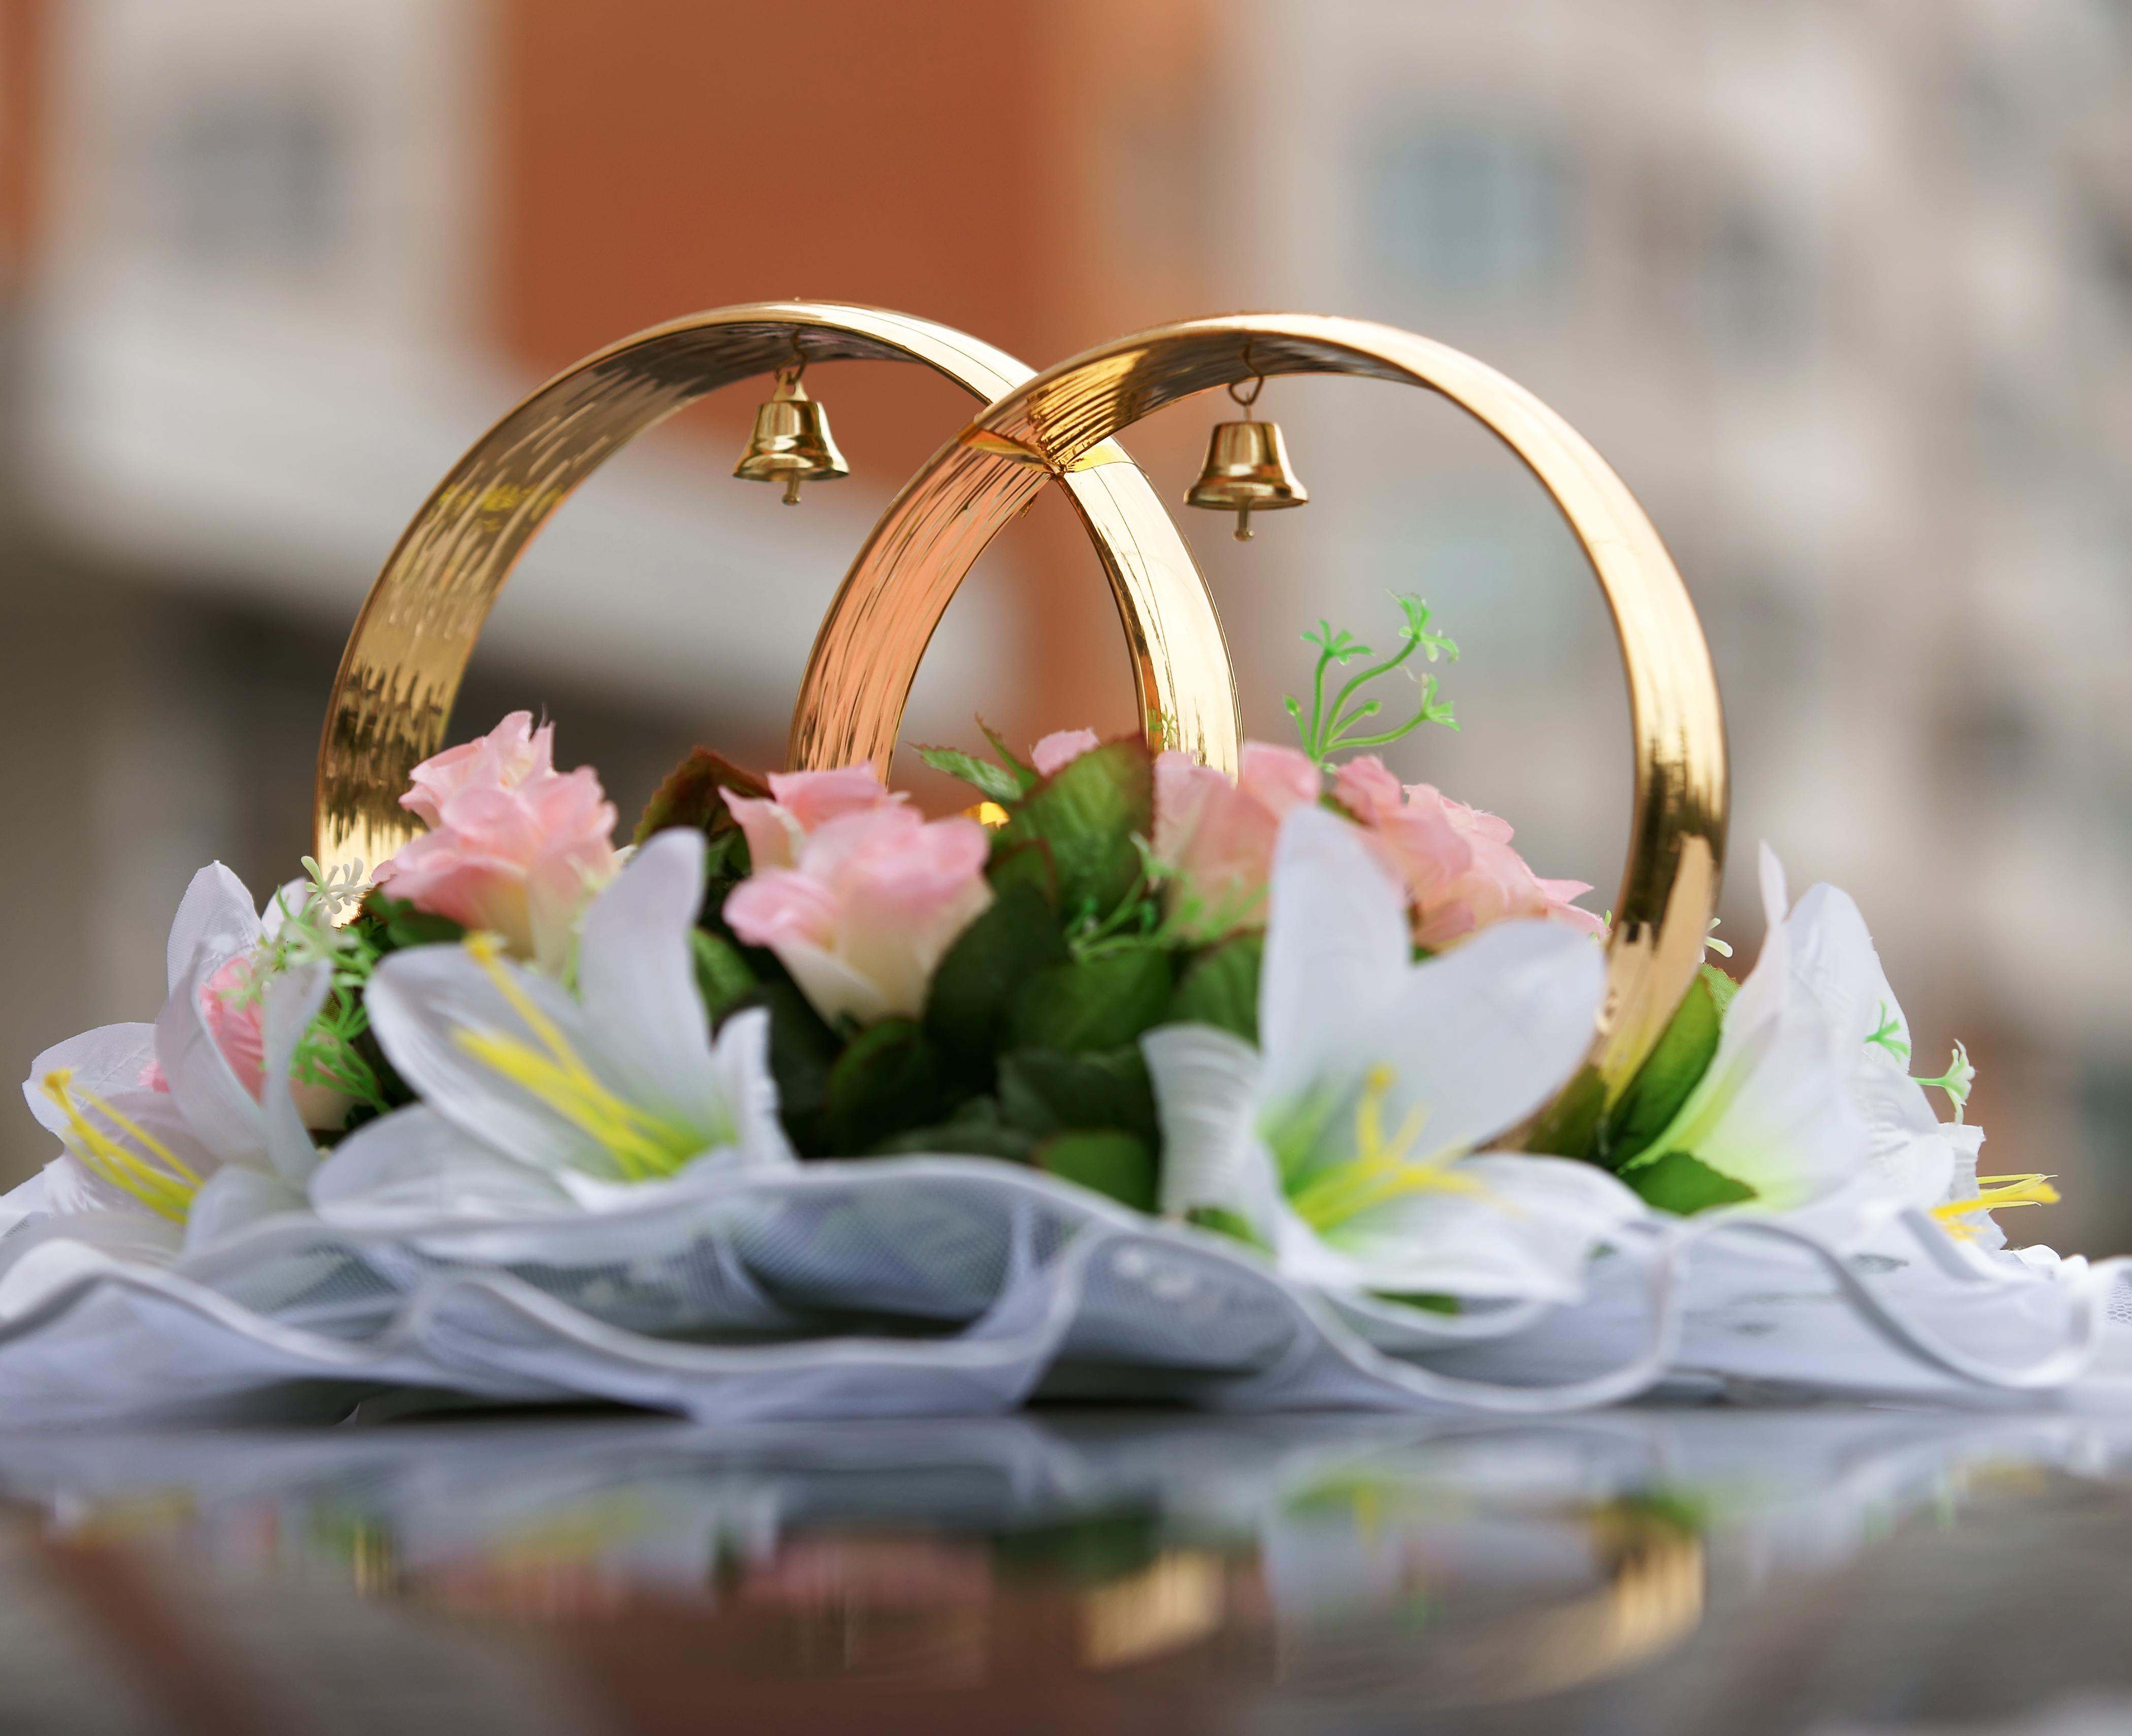 Взросла, видео картинки со свадьбой